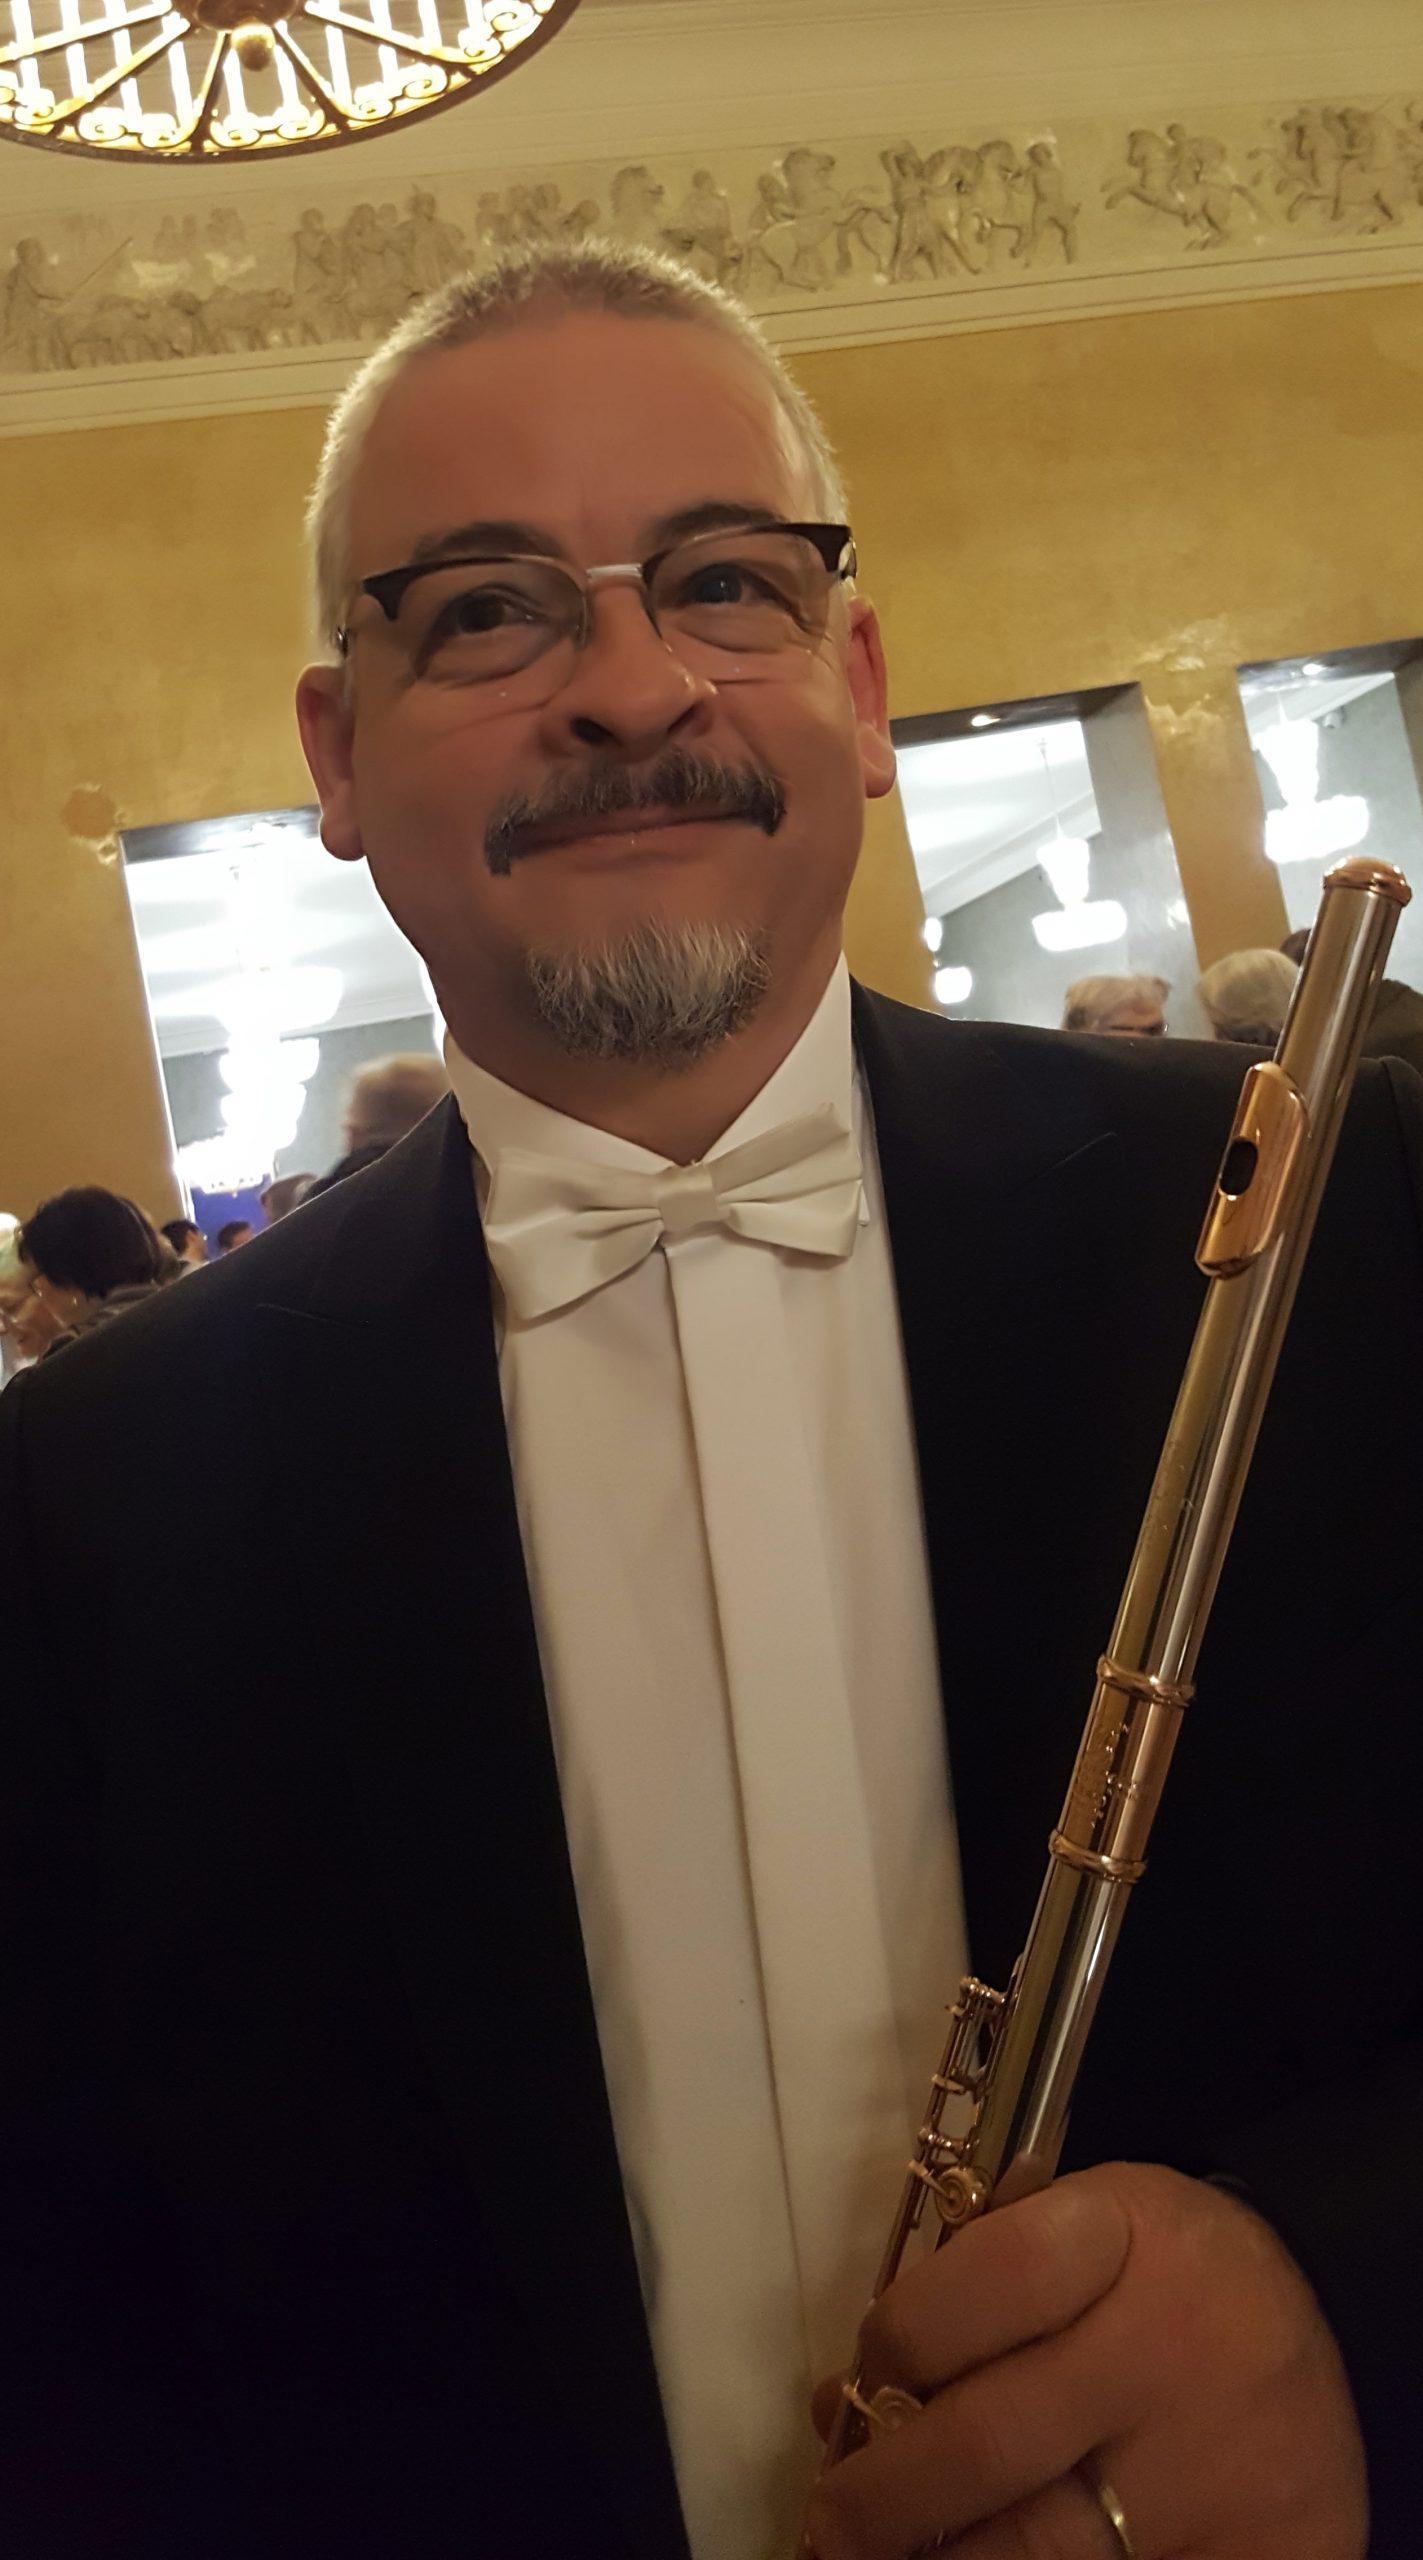 Alessandro visintini flute